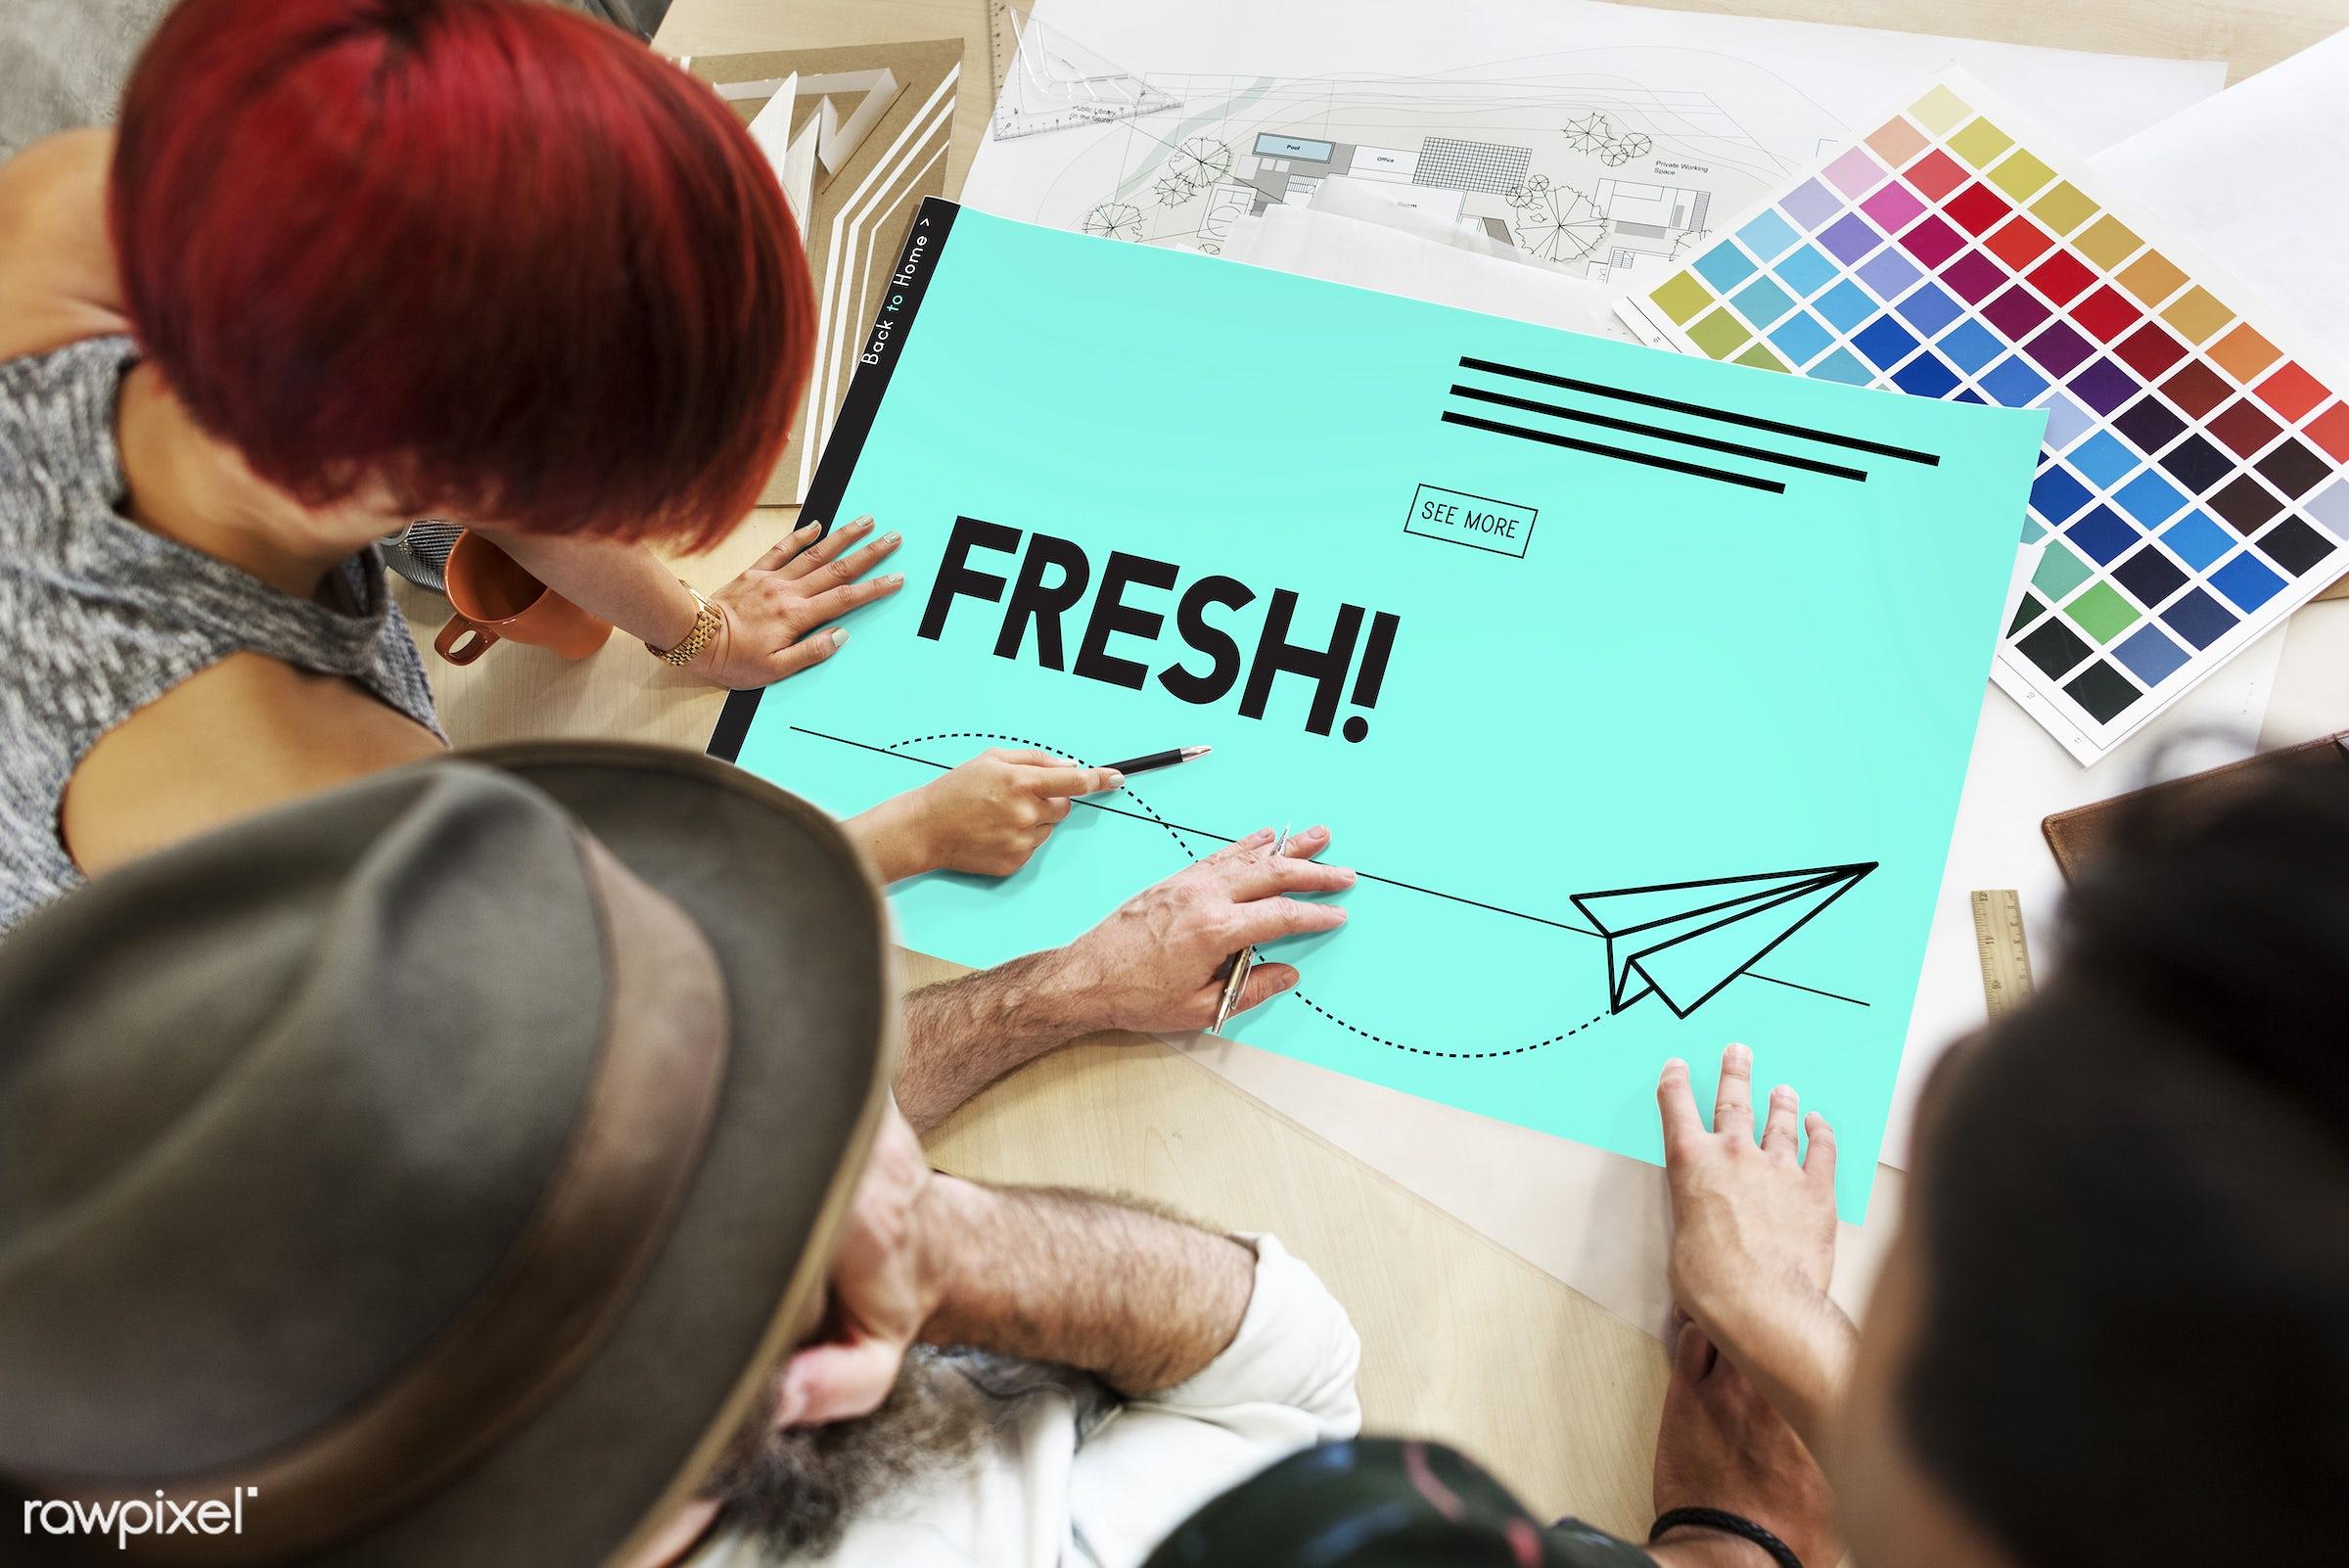 aeroplane, art, color chart, colors, creative, creativity, design, digital, discussion, female, fresh, graphic, green, hands...